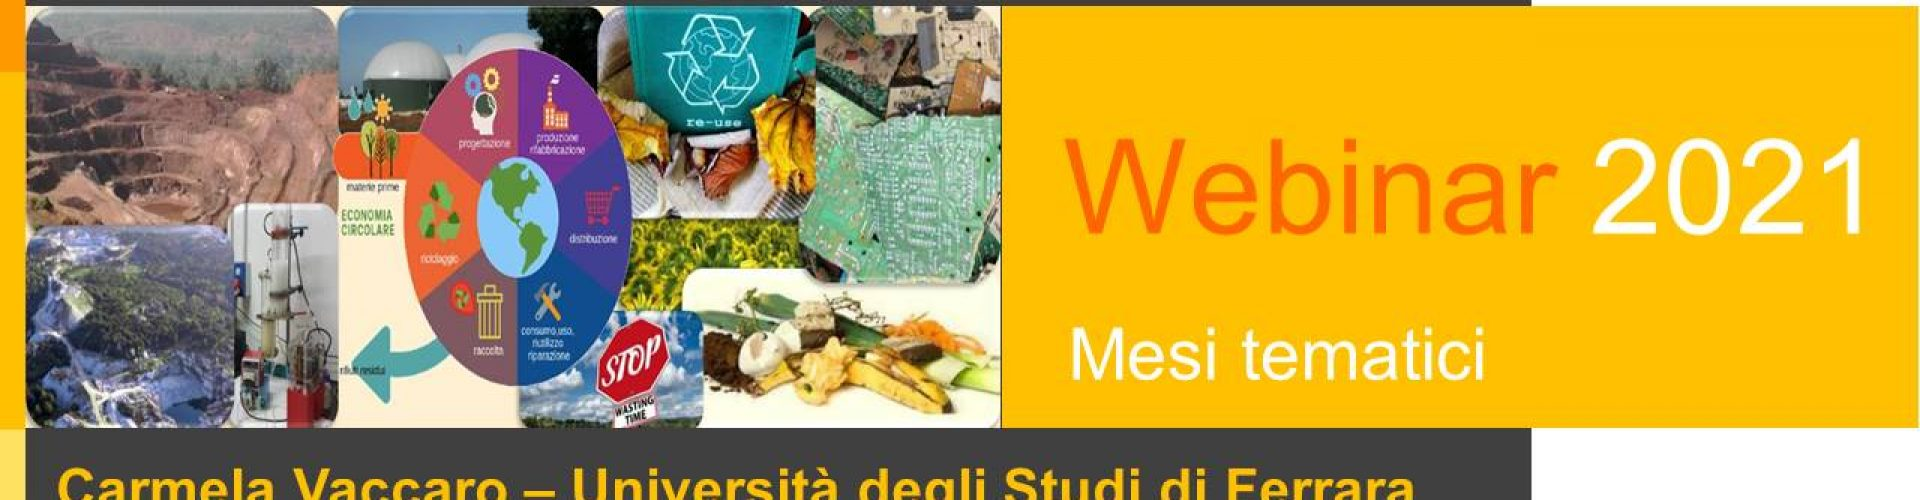 20210622_webinar GIUGNO - Vaccaro